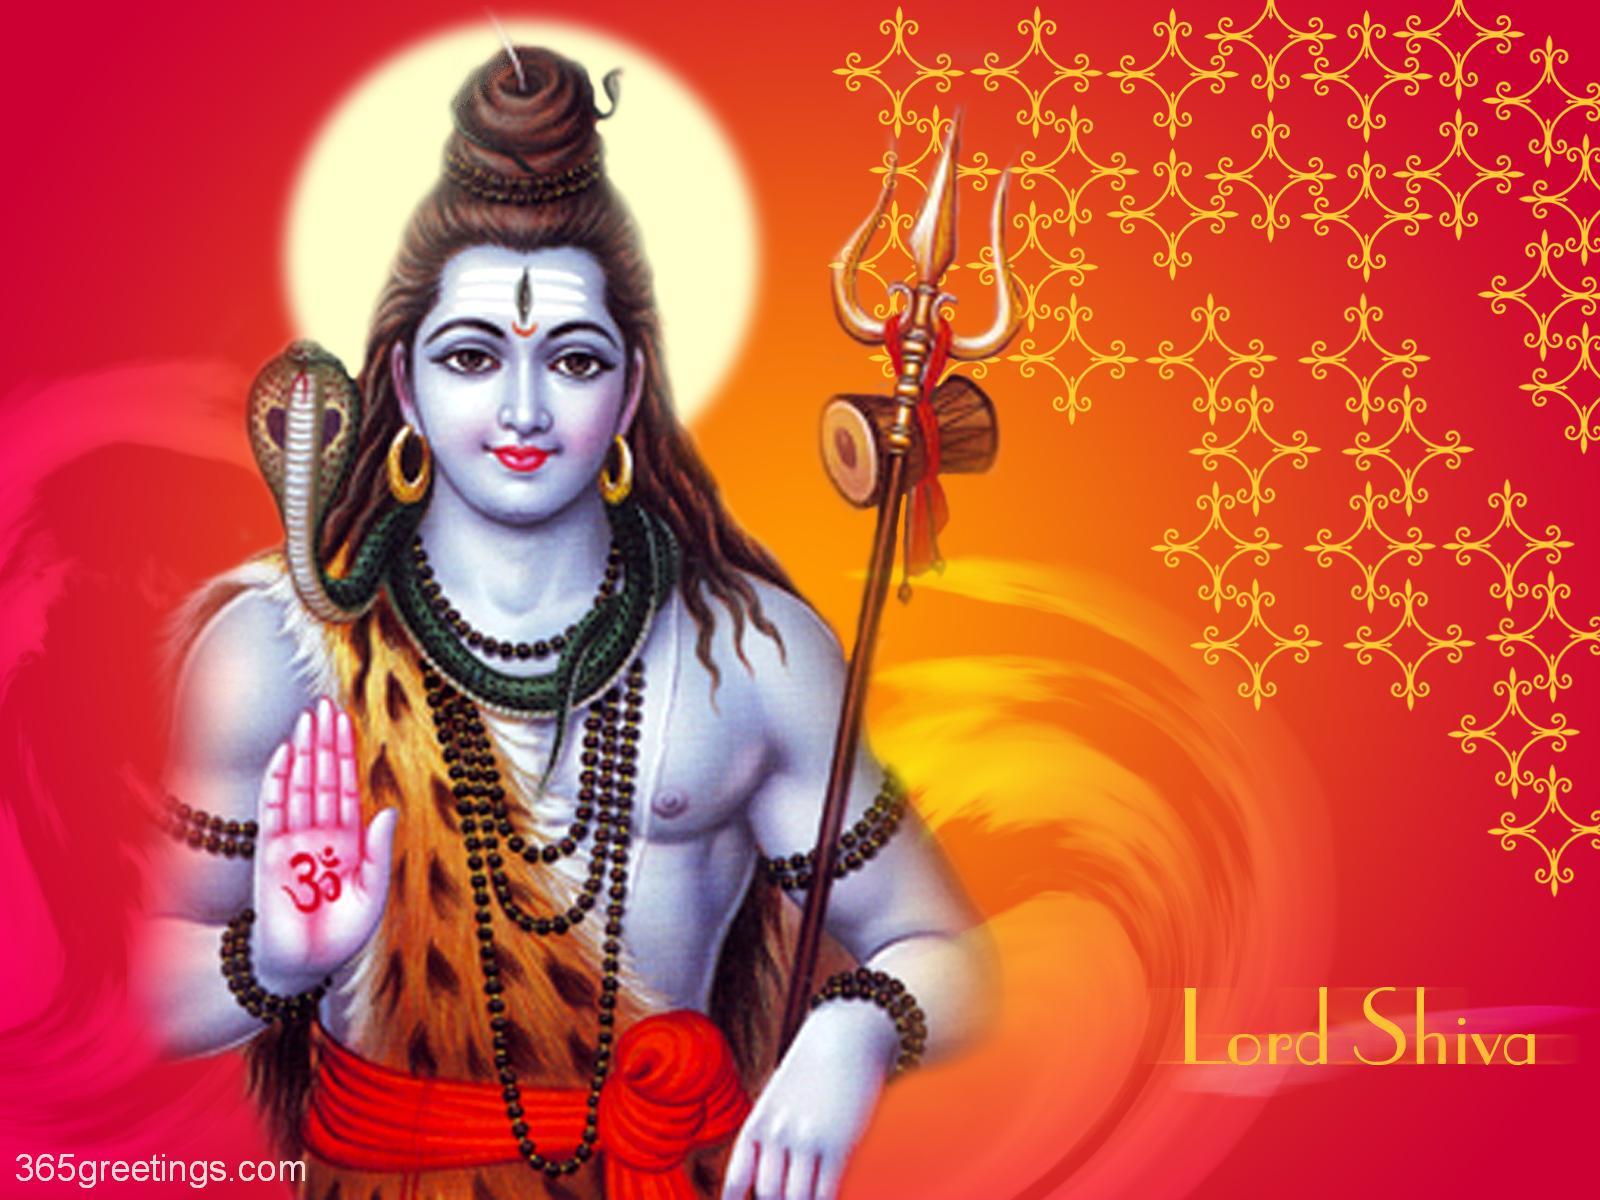 http://3.bp.blogspot.com/-6zuZx4tfp7c/TwiRQdk7pMI/AAAAAAAALeo/1Rs9AFk2OL4/s1600/Lord+Shiva-Wallpapers-hara+%25284%2529.jpg